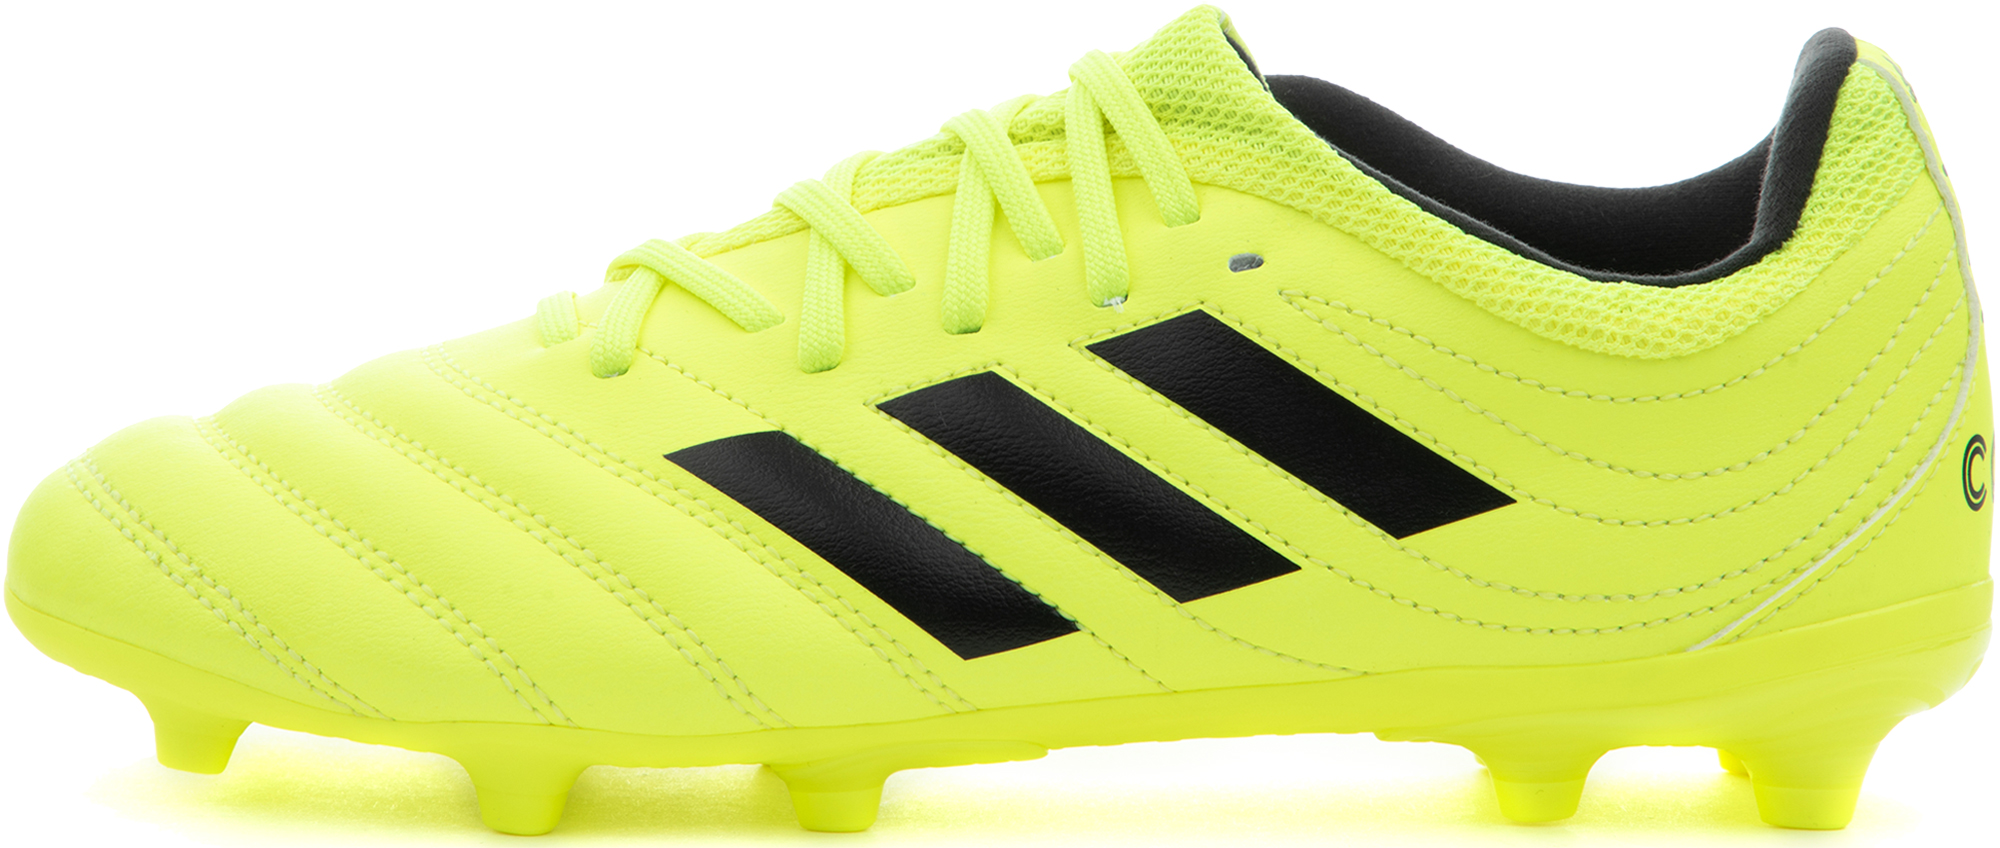 Adidas Бутсы детские Copa 19.3 FG, размер 37,5